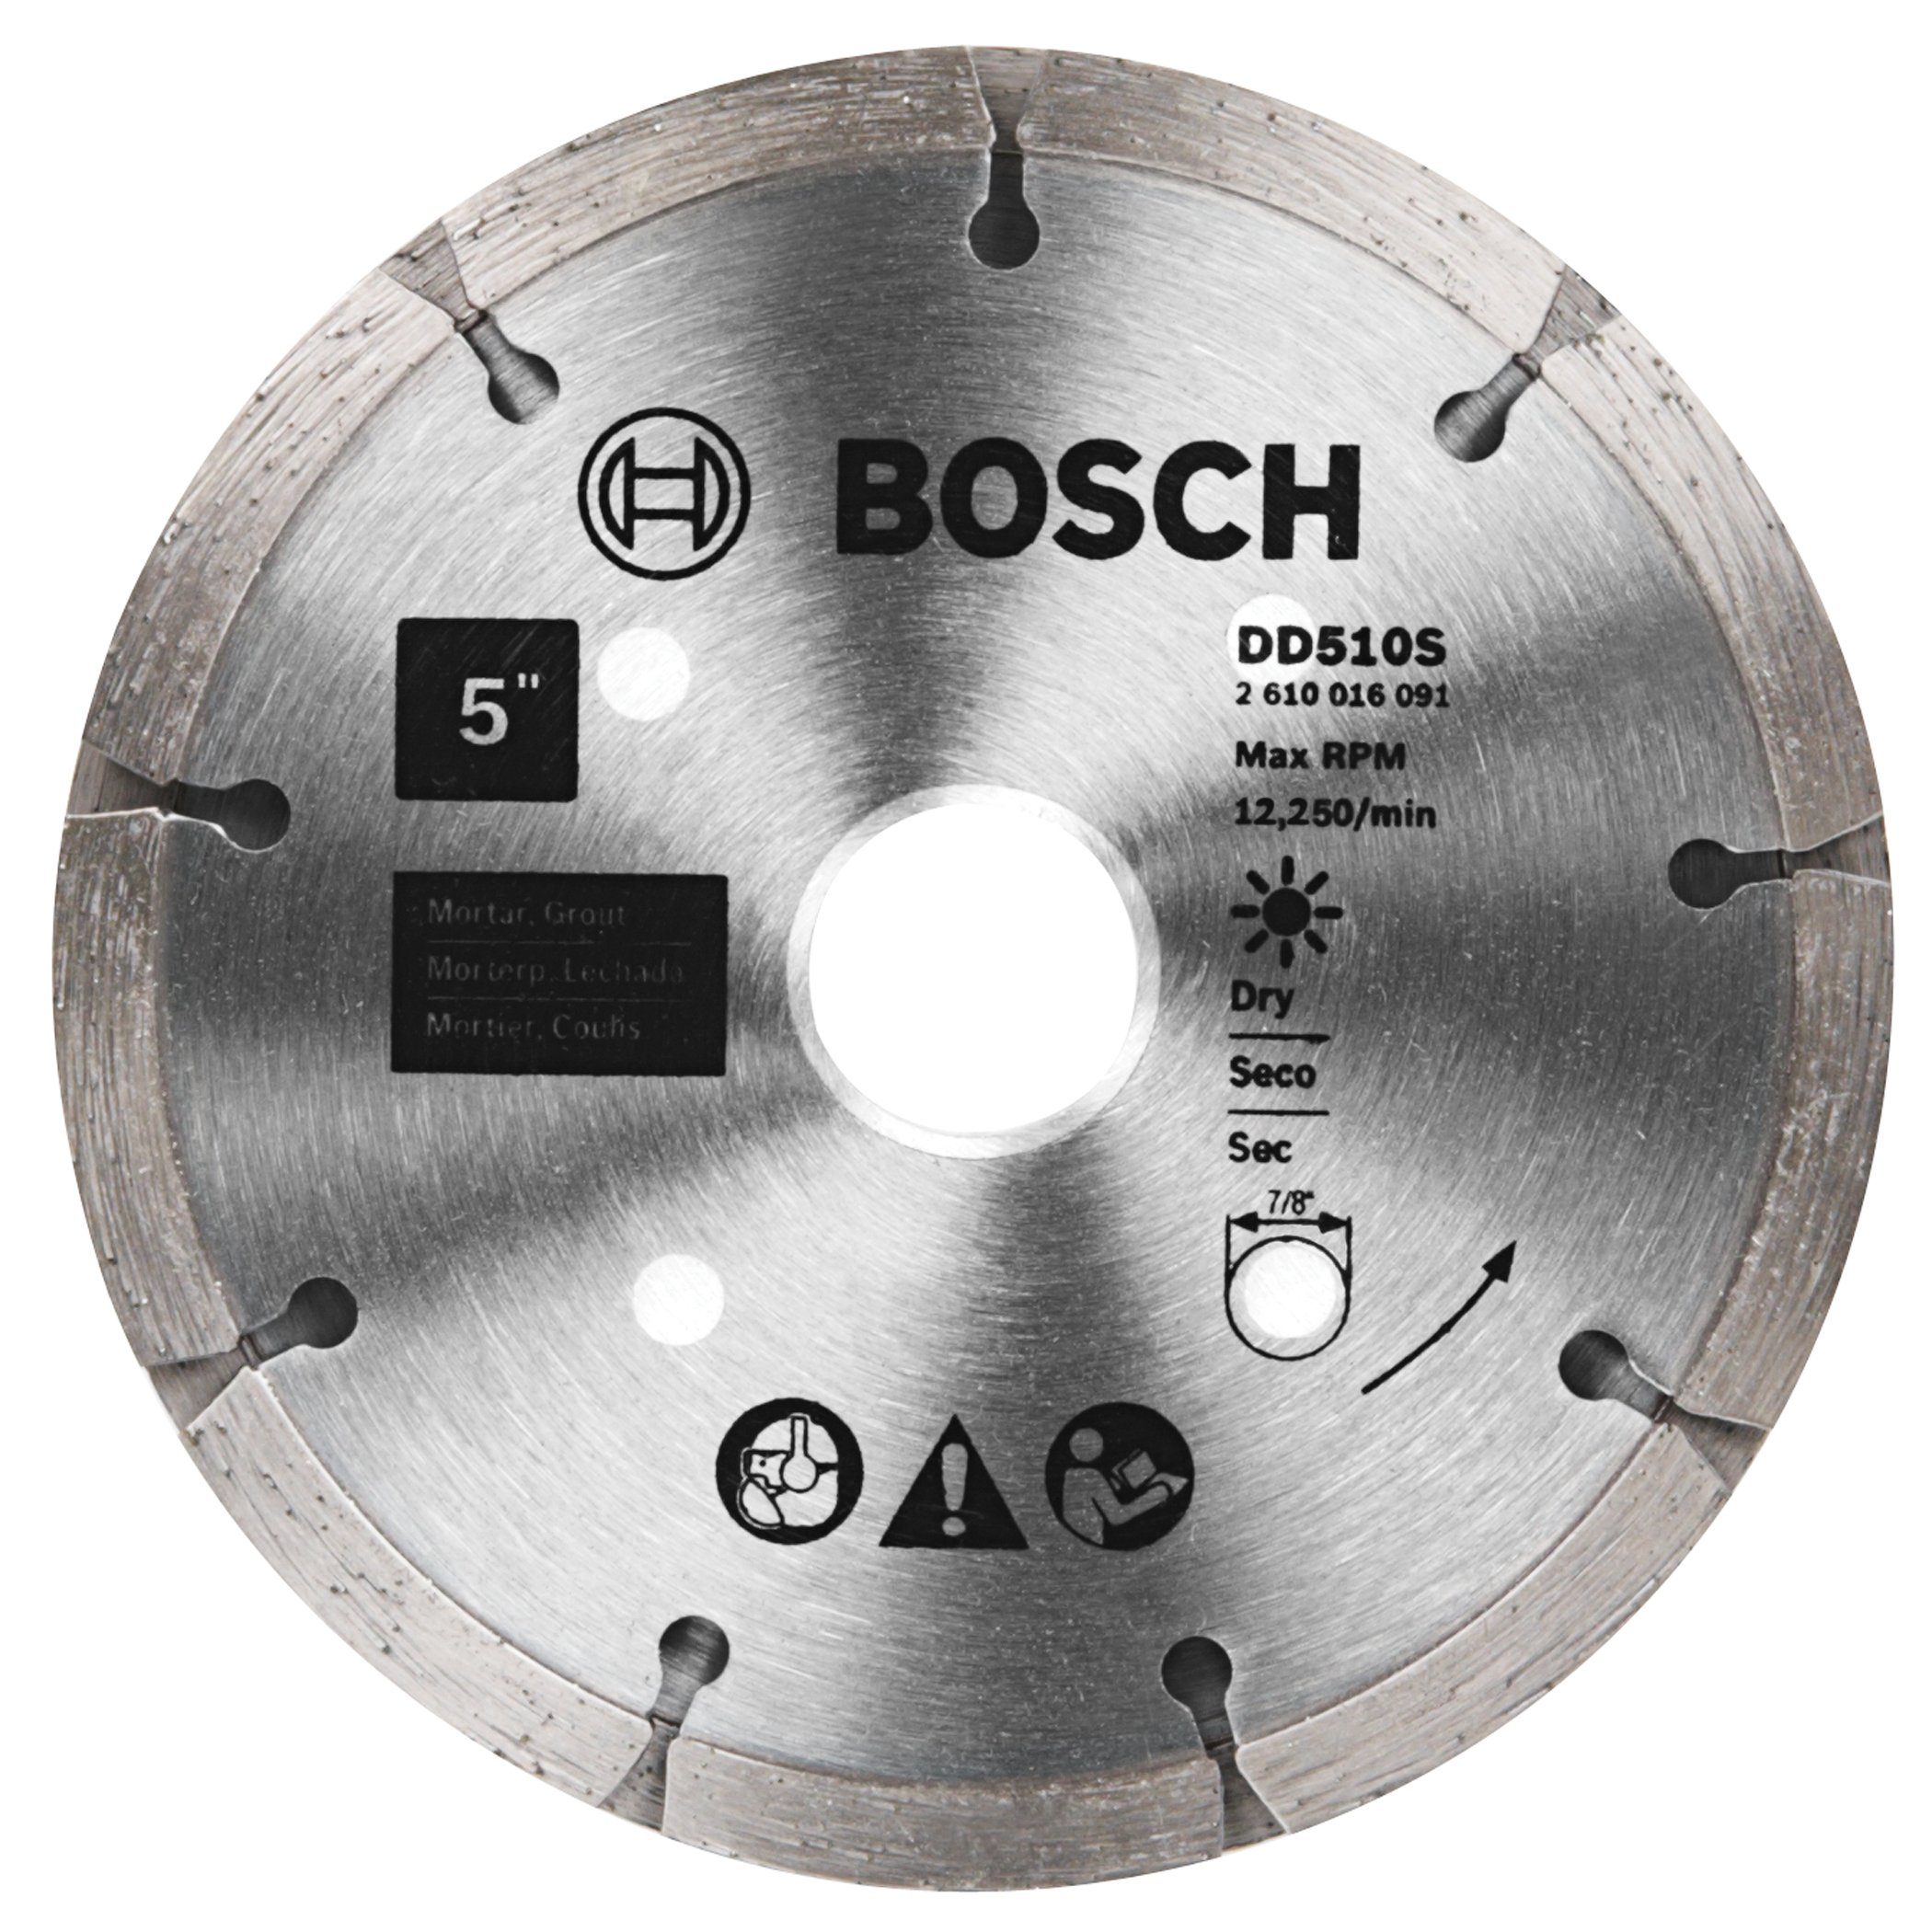 Disco de Diamante BOSCH DD510S Hoja punteadora de 5 pulg. para sandwich